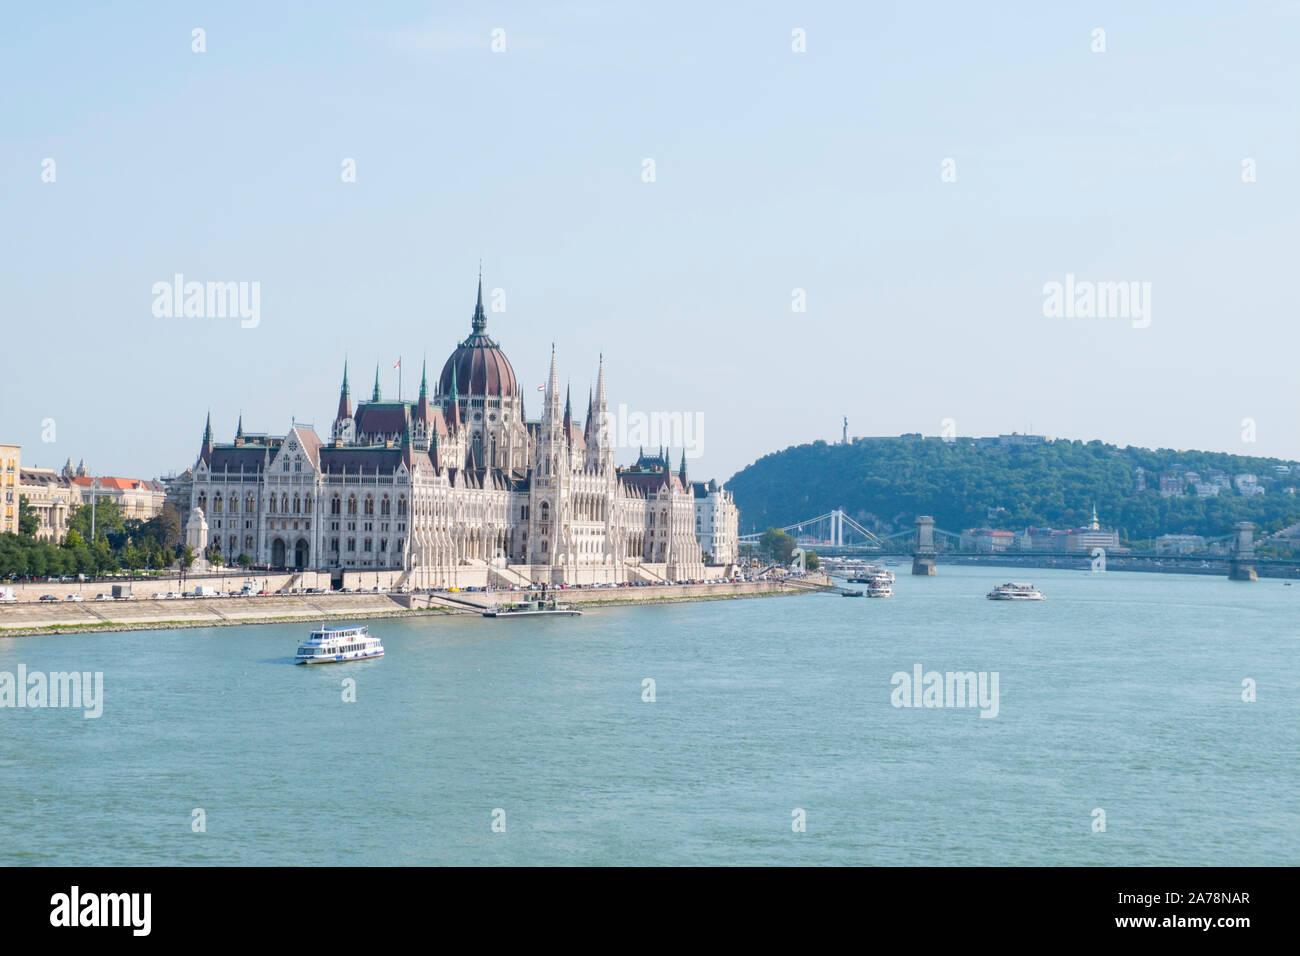 Országház, Hungarian Parliament Building, Budapest, Hungary Stock Photo